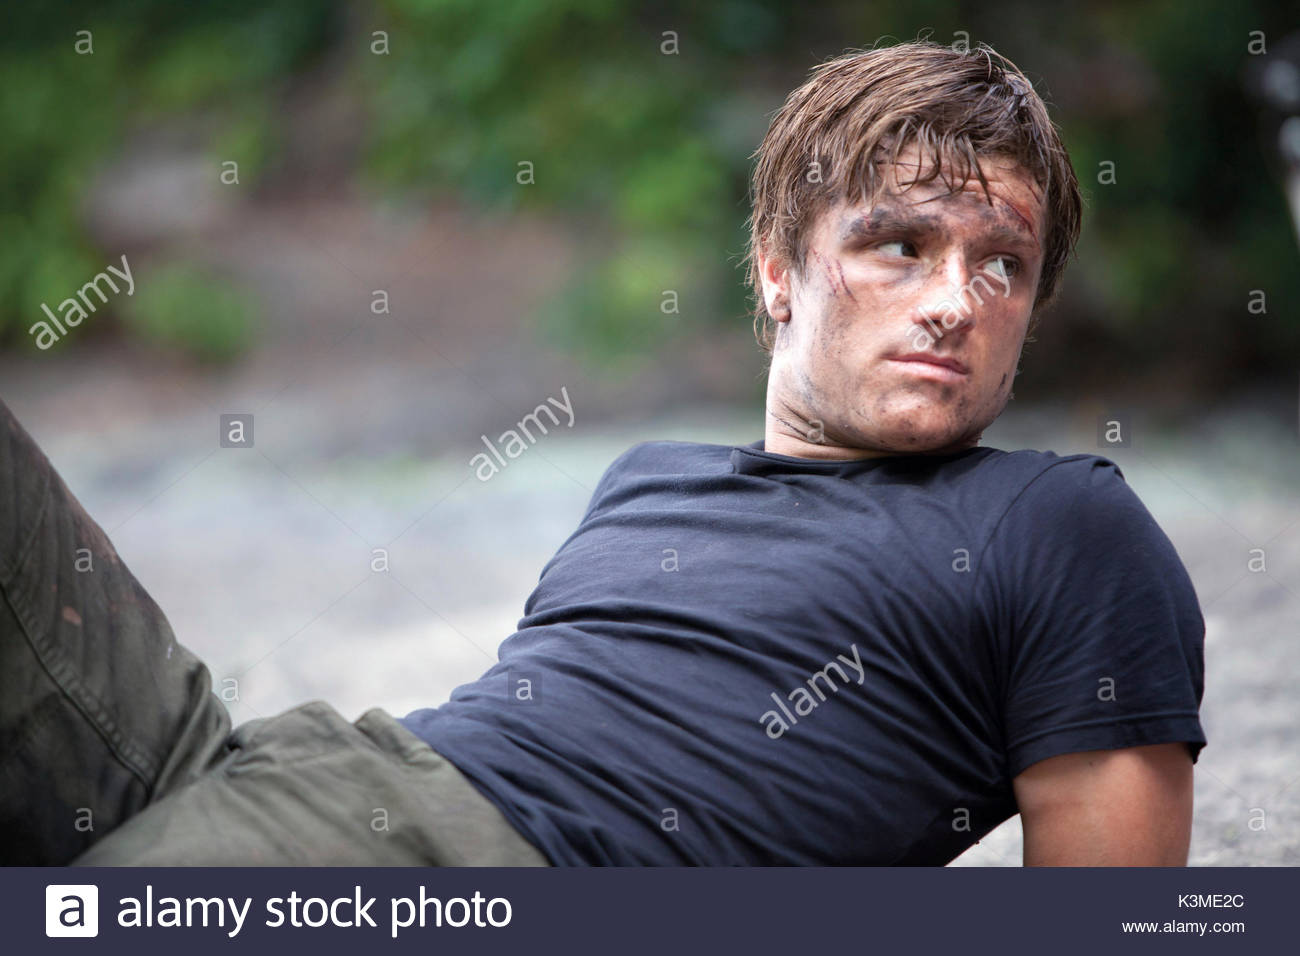 THE HUNGER GAMES [US 2012] JOSH HUTCHERSON as Peeta Mellark     Date: 2012 - Stock Image